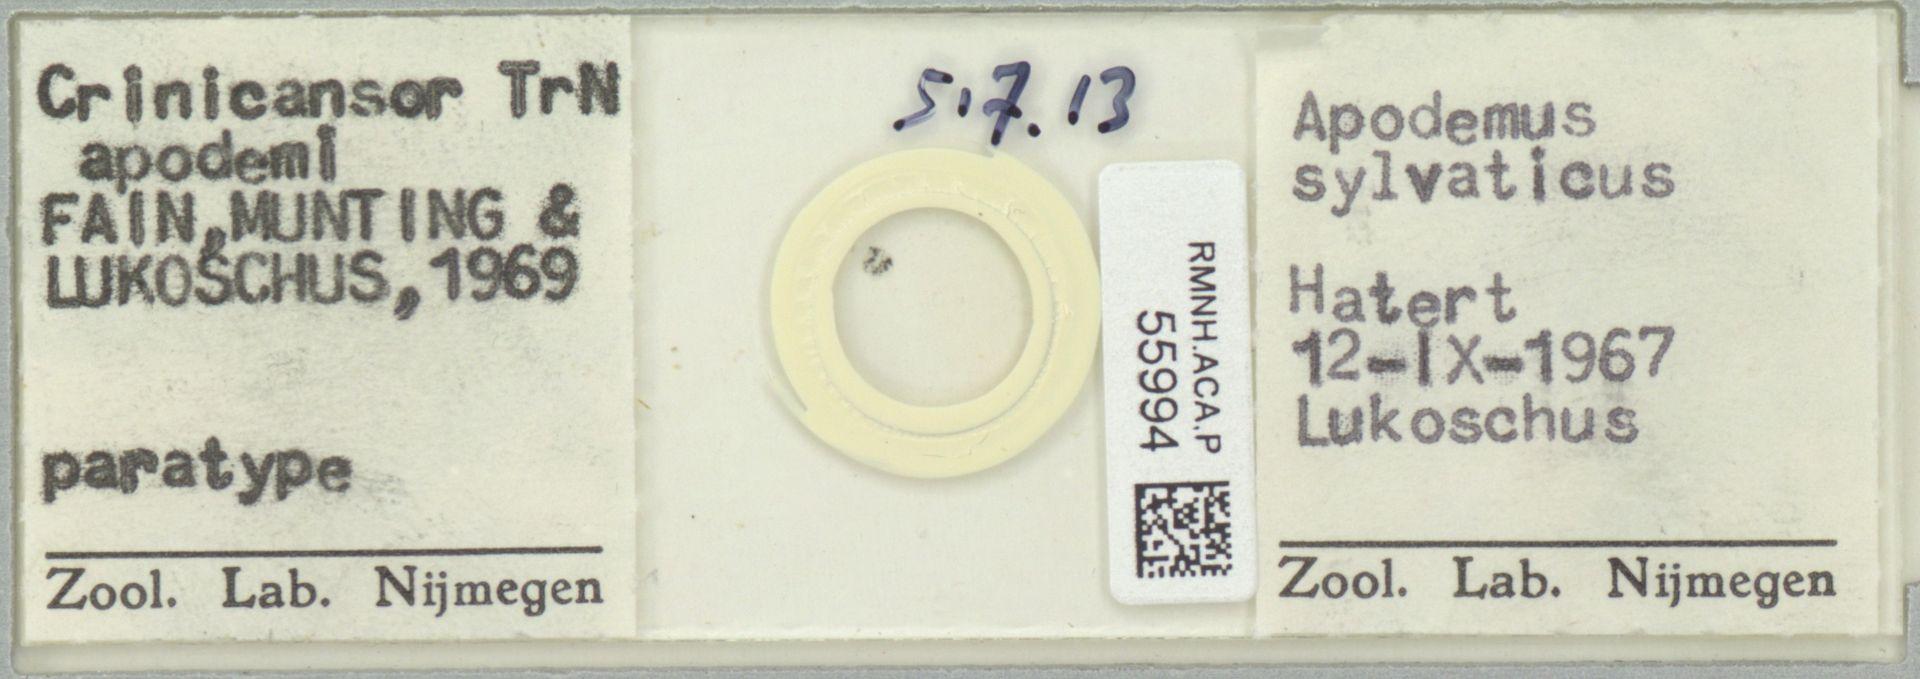 RMNH.ACA.P.55994 | Crinicansor apodemi Fain, Munting & Lukoschus, 1969